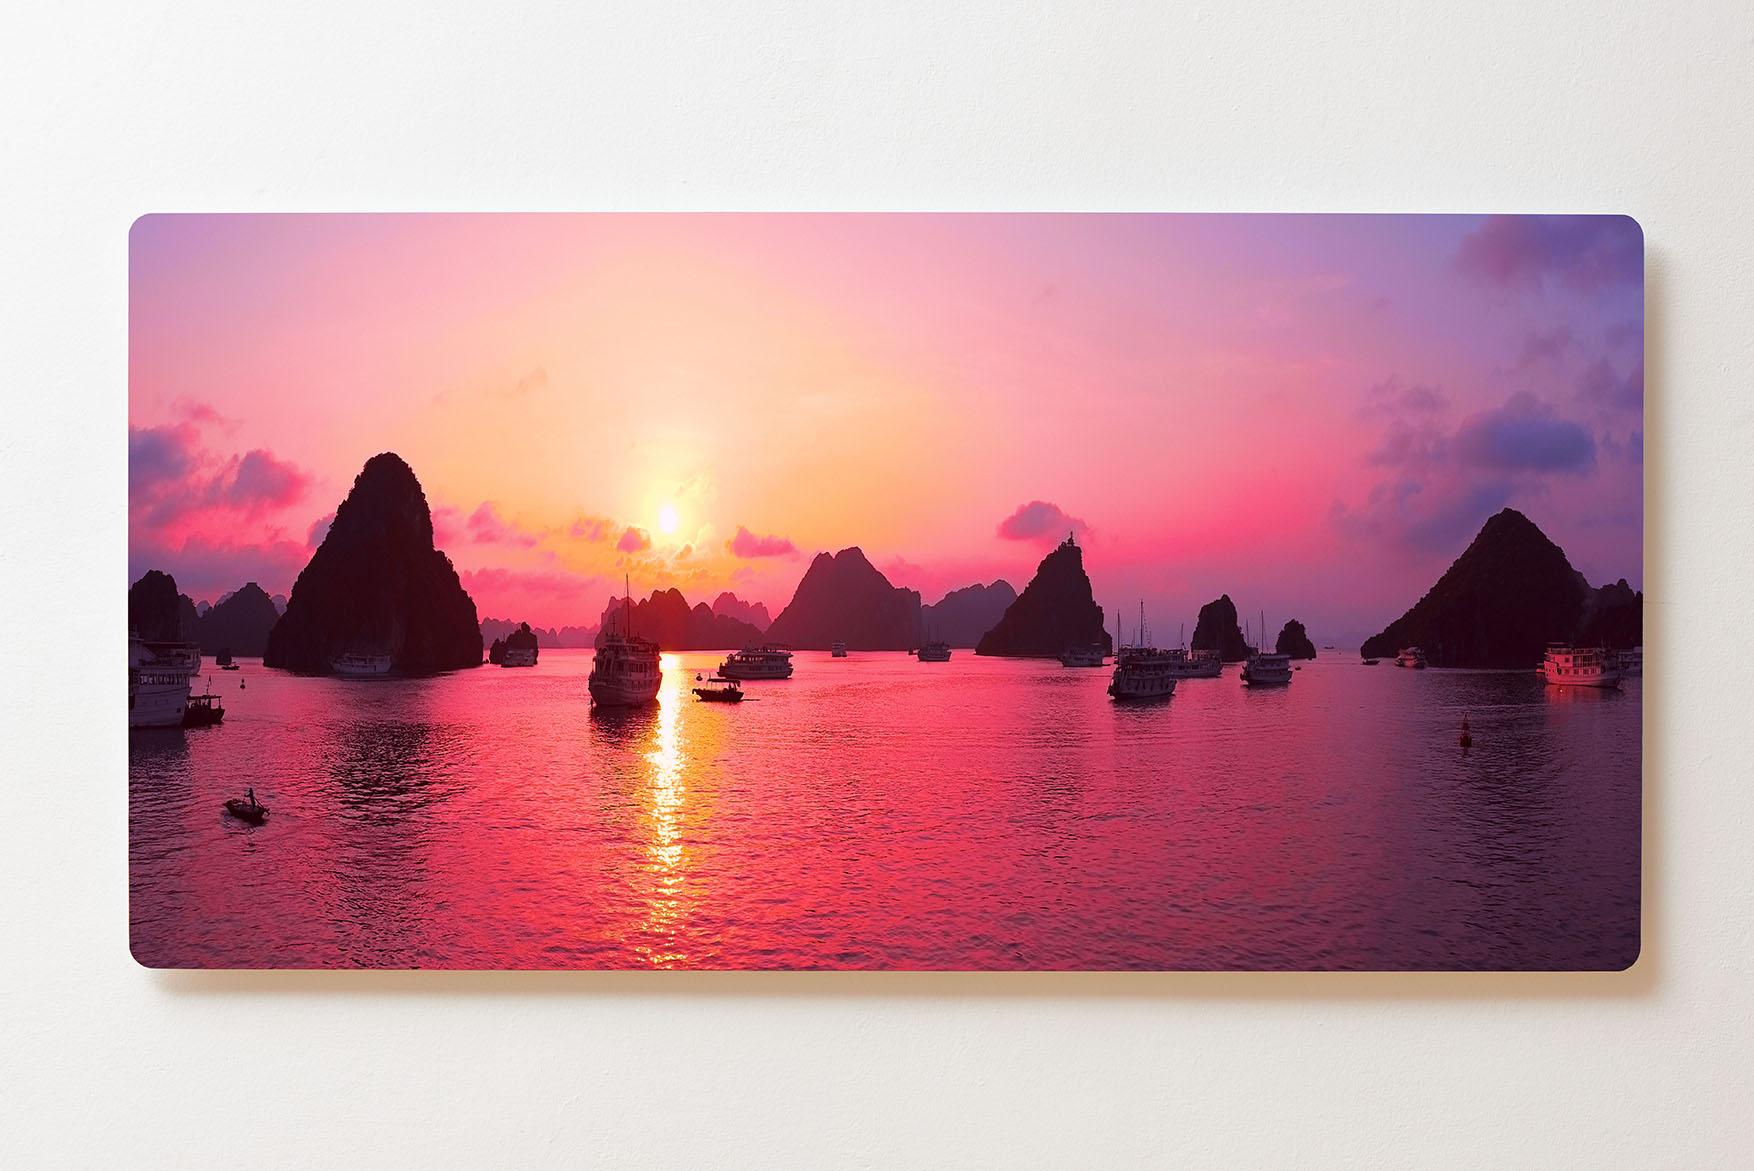 Magnettafel BACKLIGHT 120x60cm Motiv-Wandbild M152 Sonnenuntergang Meer